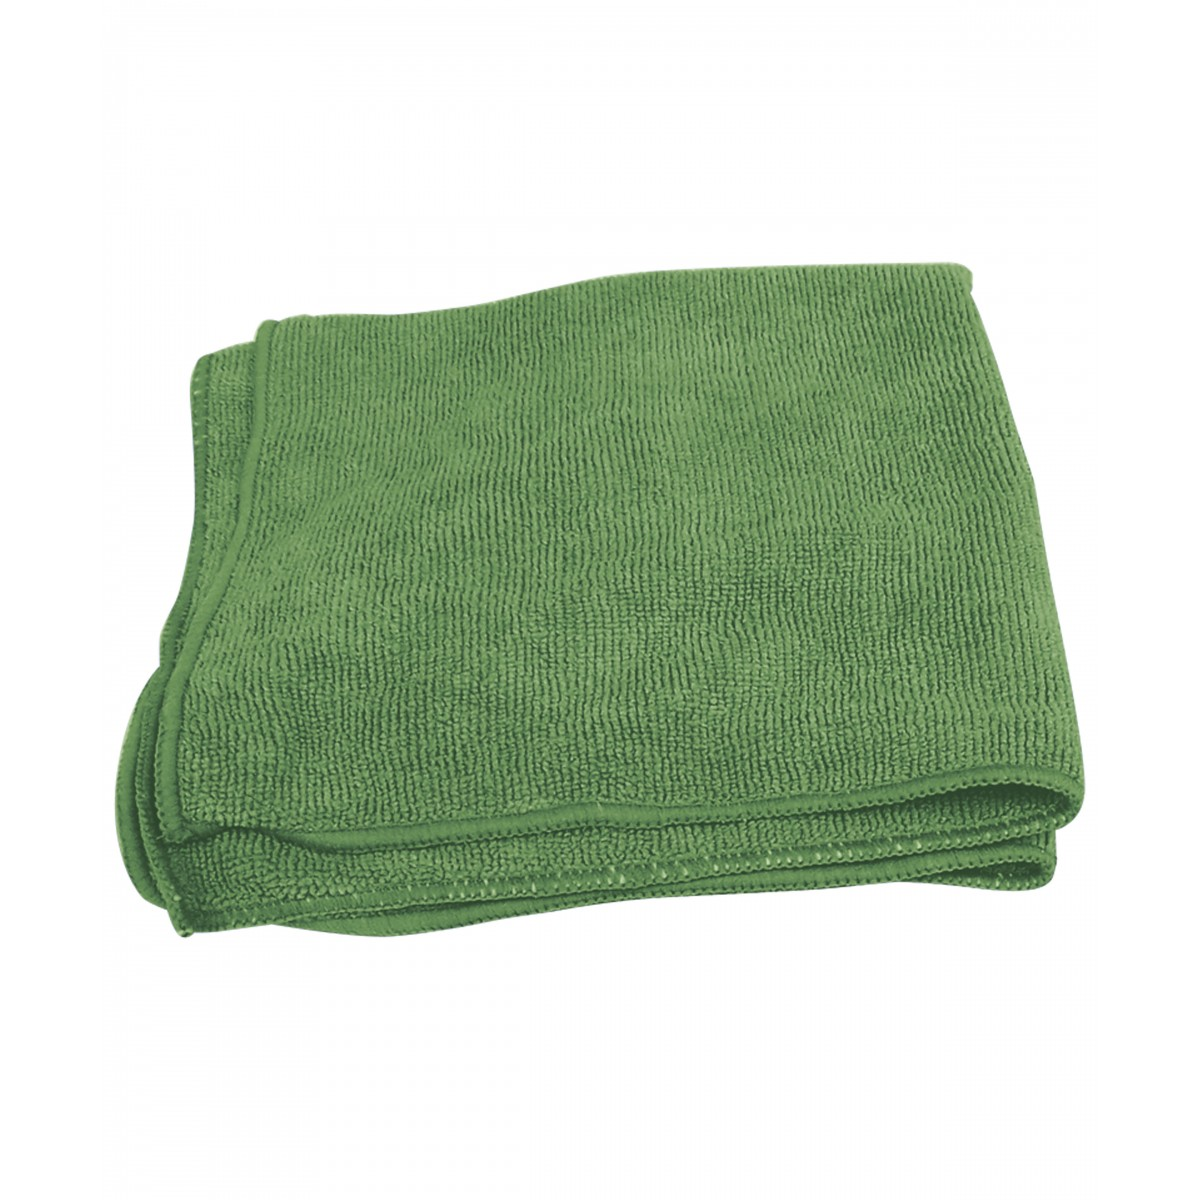 Linge Microfibre 14 x 14 vert